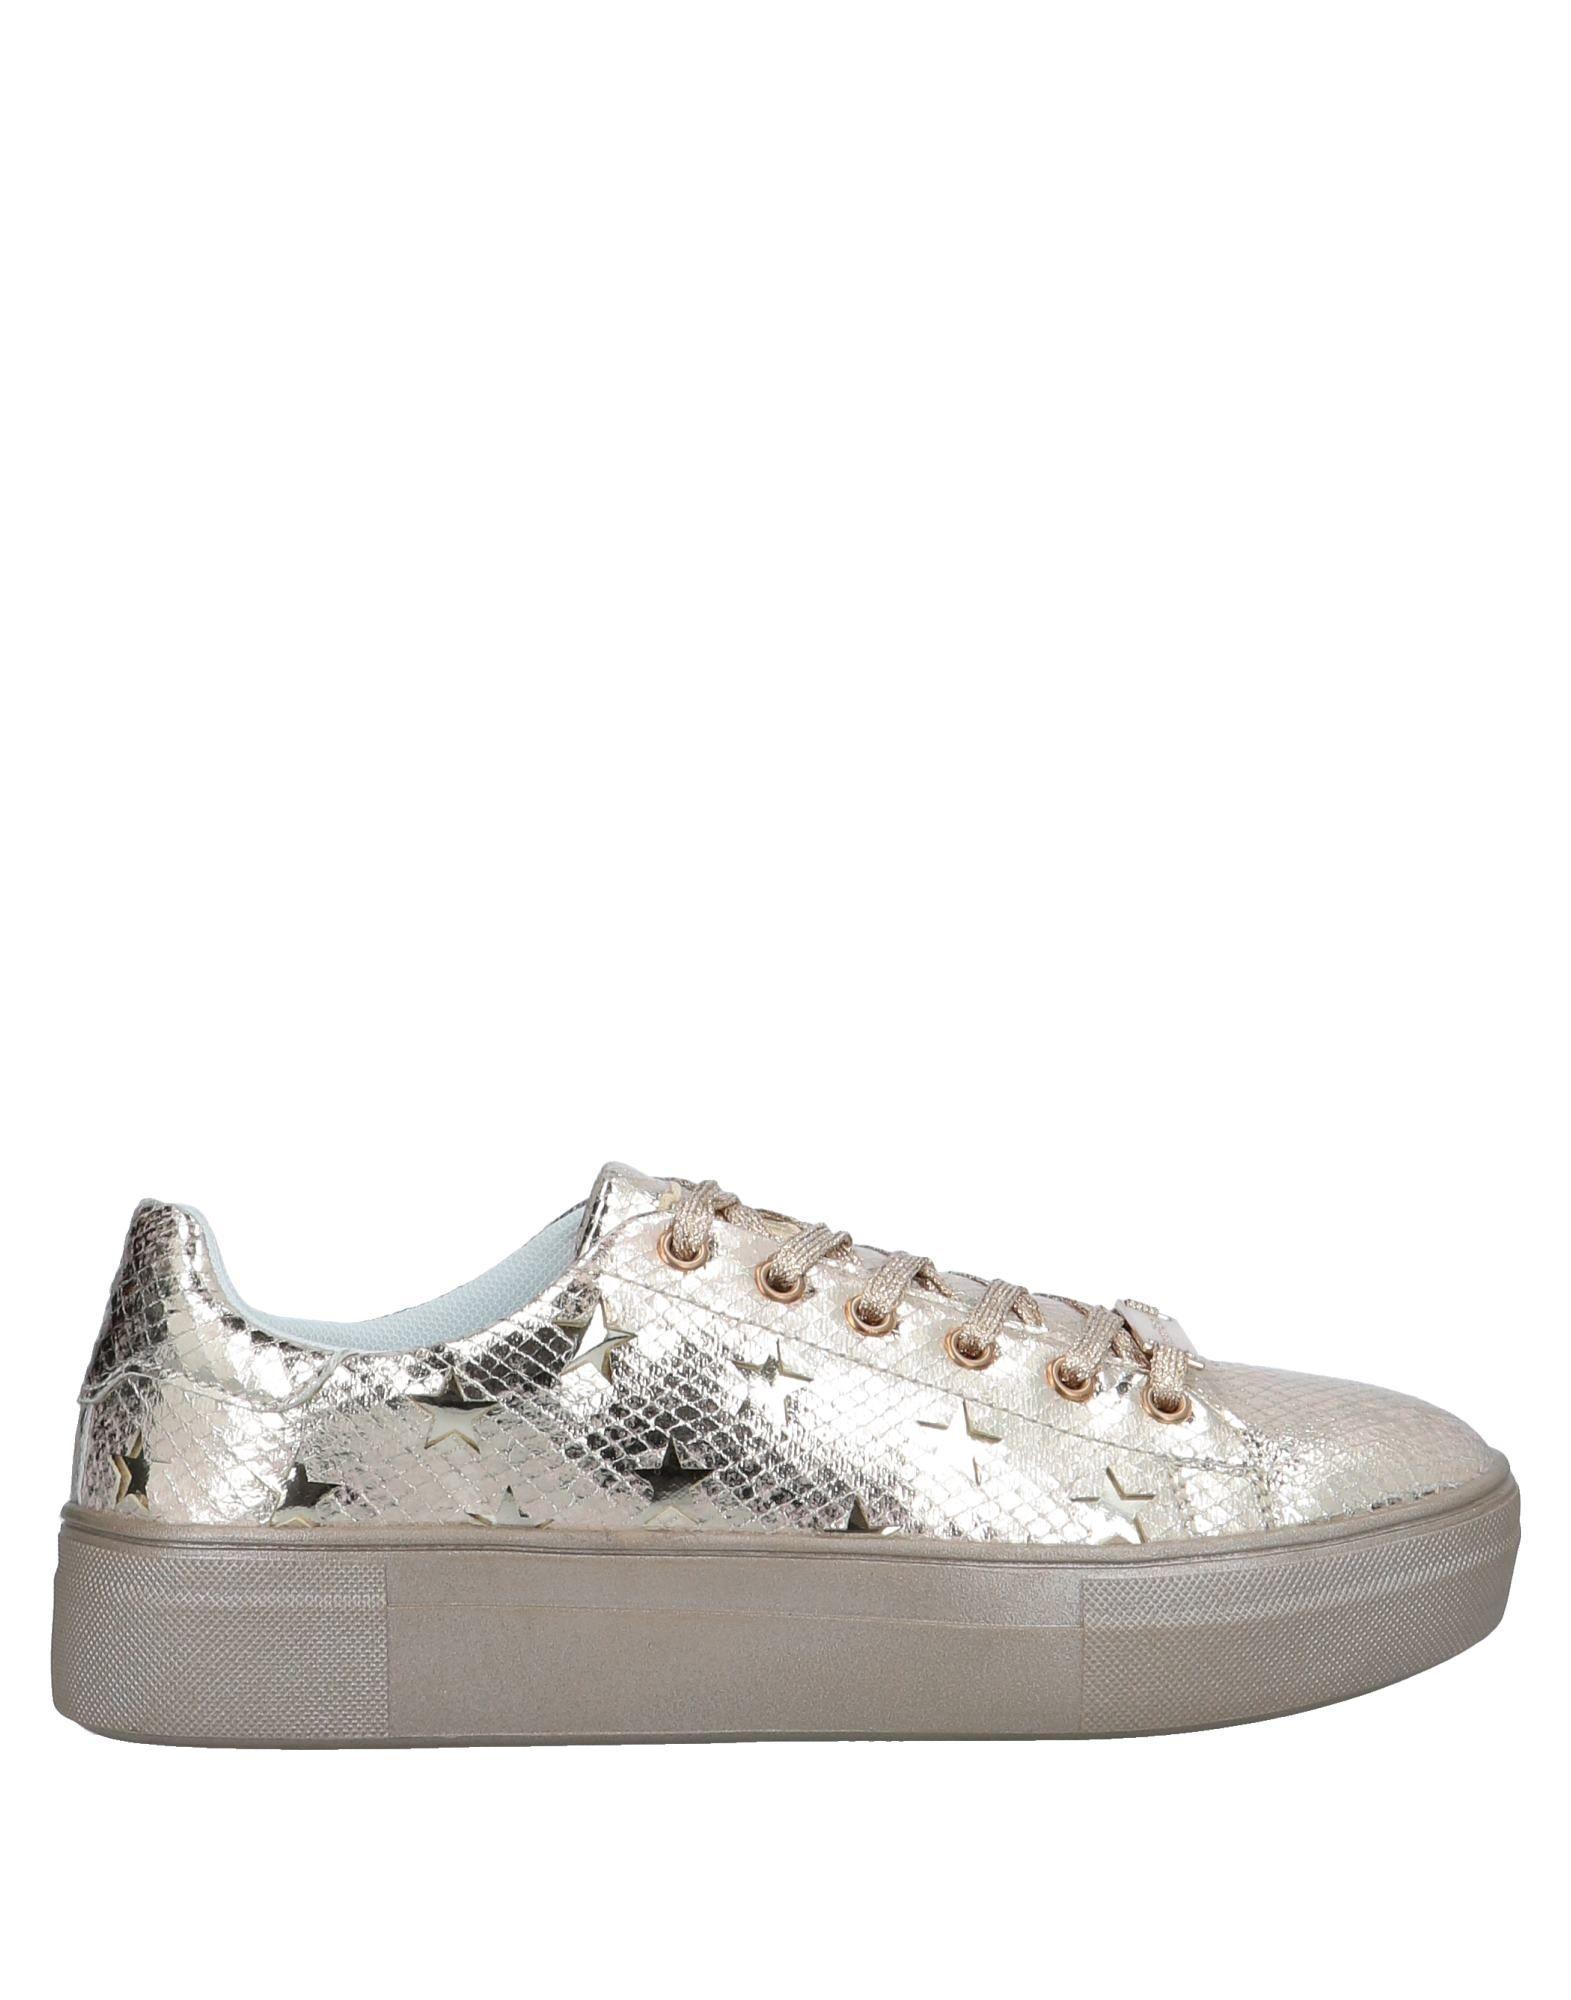 Laura Biagiotti Sneakers - Women Laura Biagiotti Sneakers - online on  Australia - Sneakers 11570262HT 61d95e